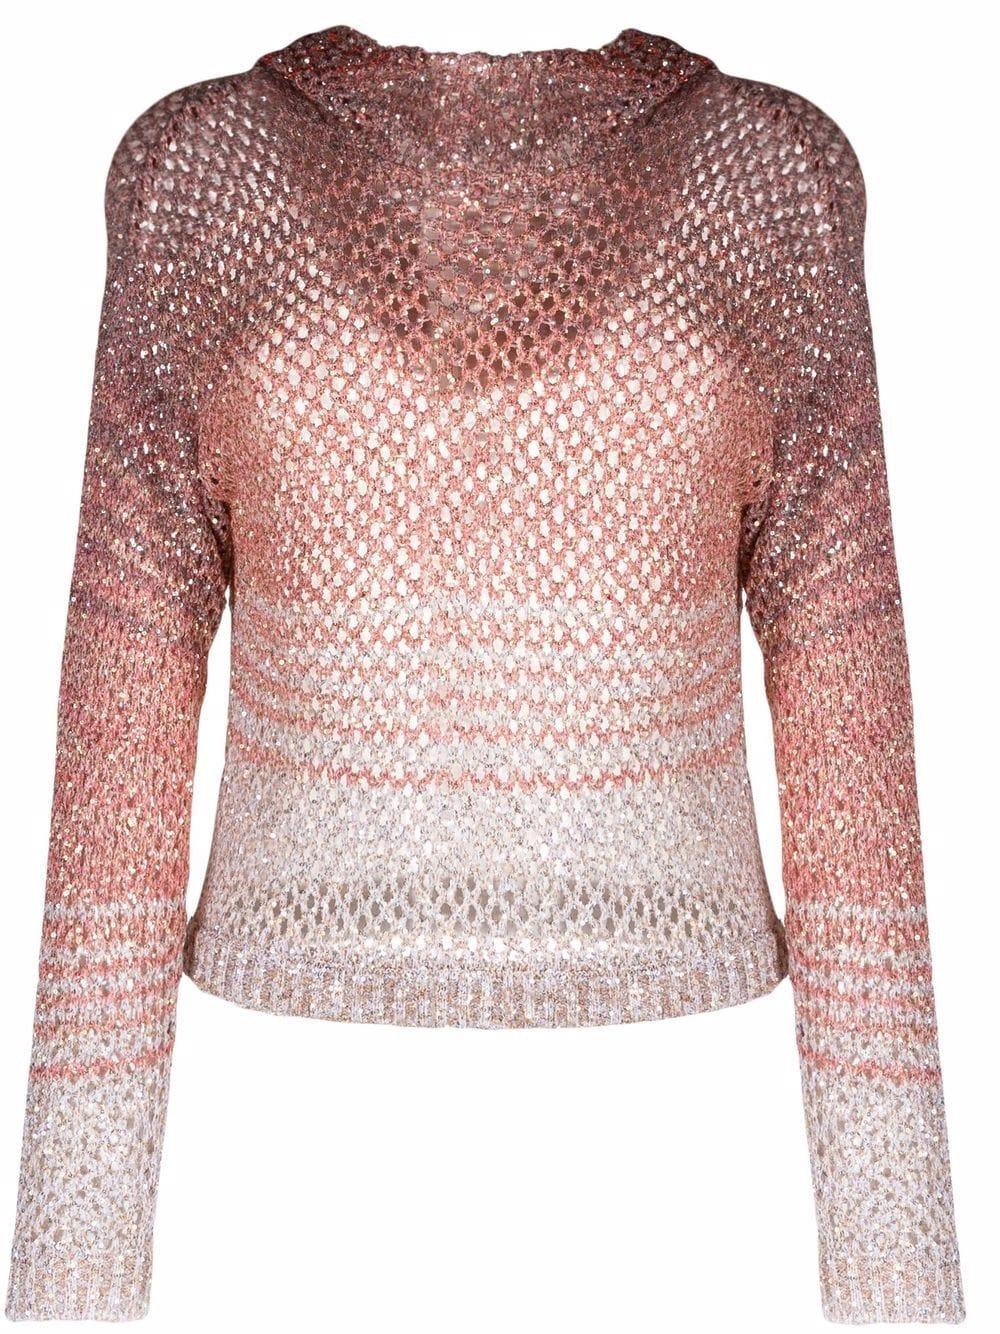 Missoni open-knit hooded jumper - Rosa